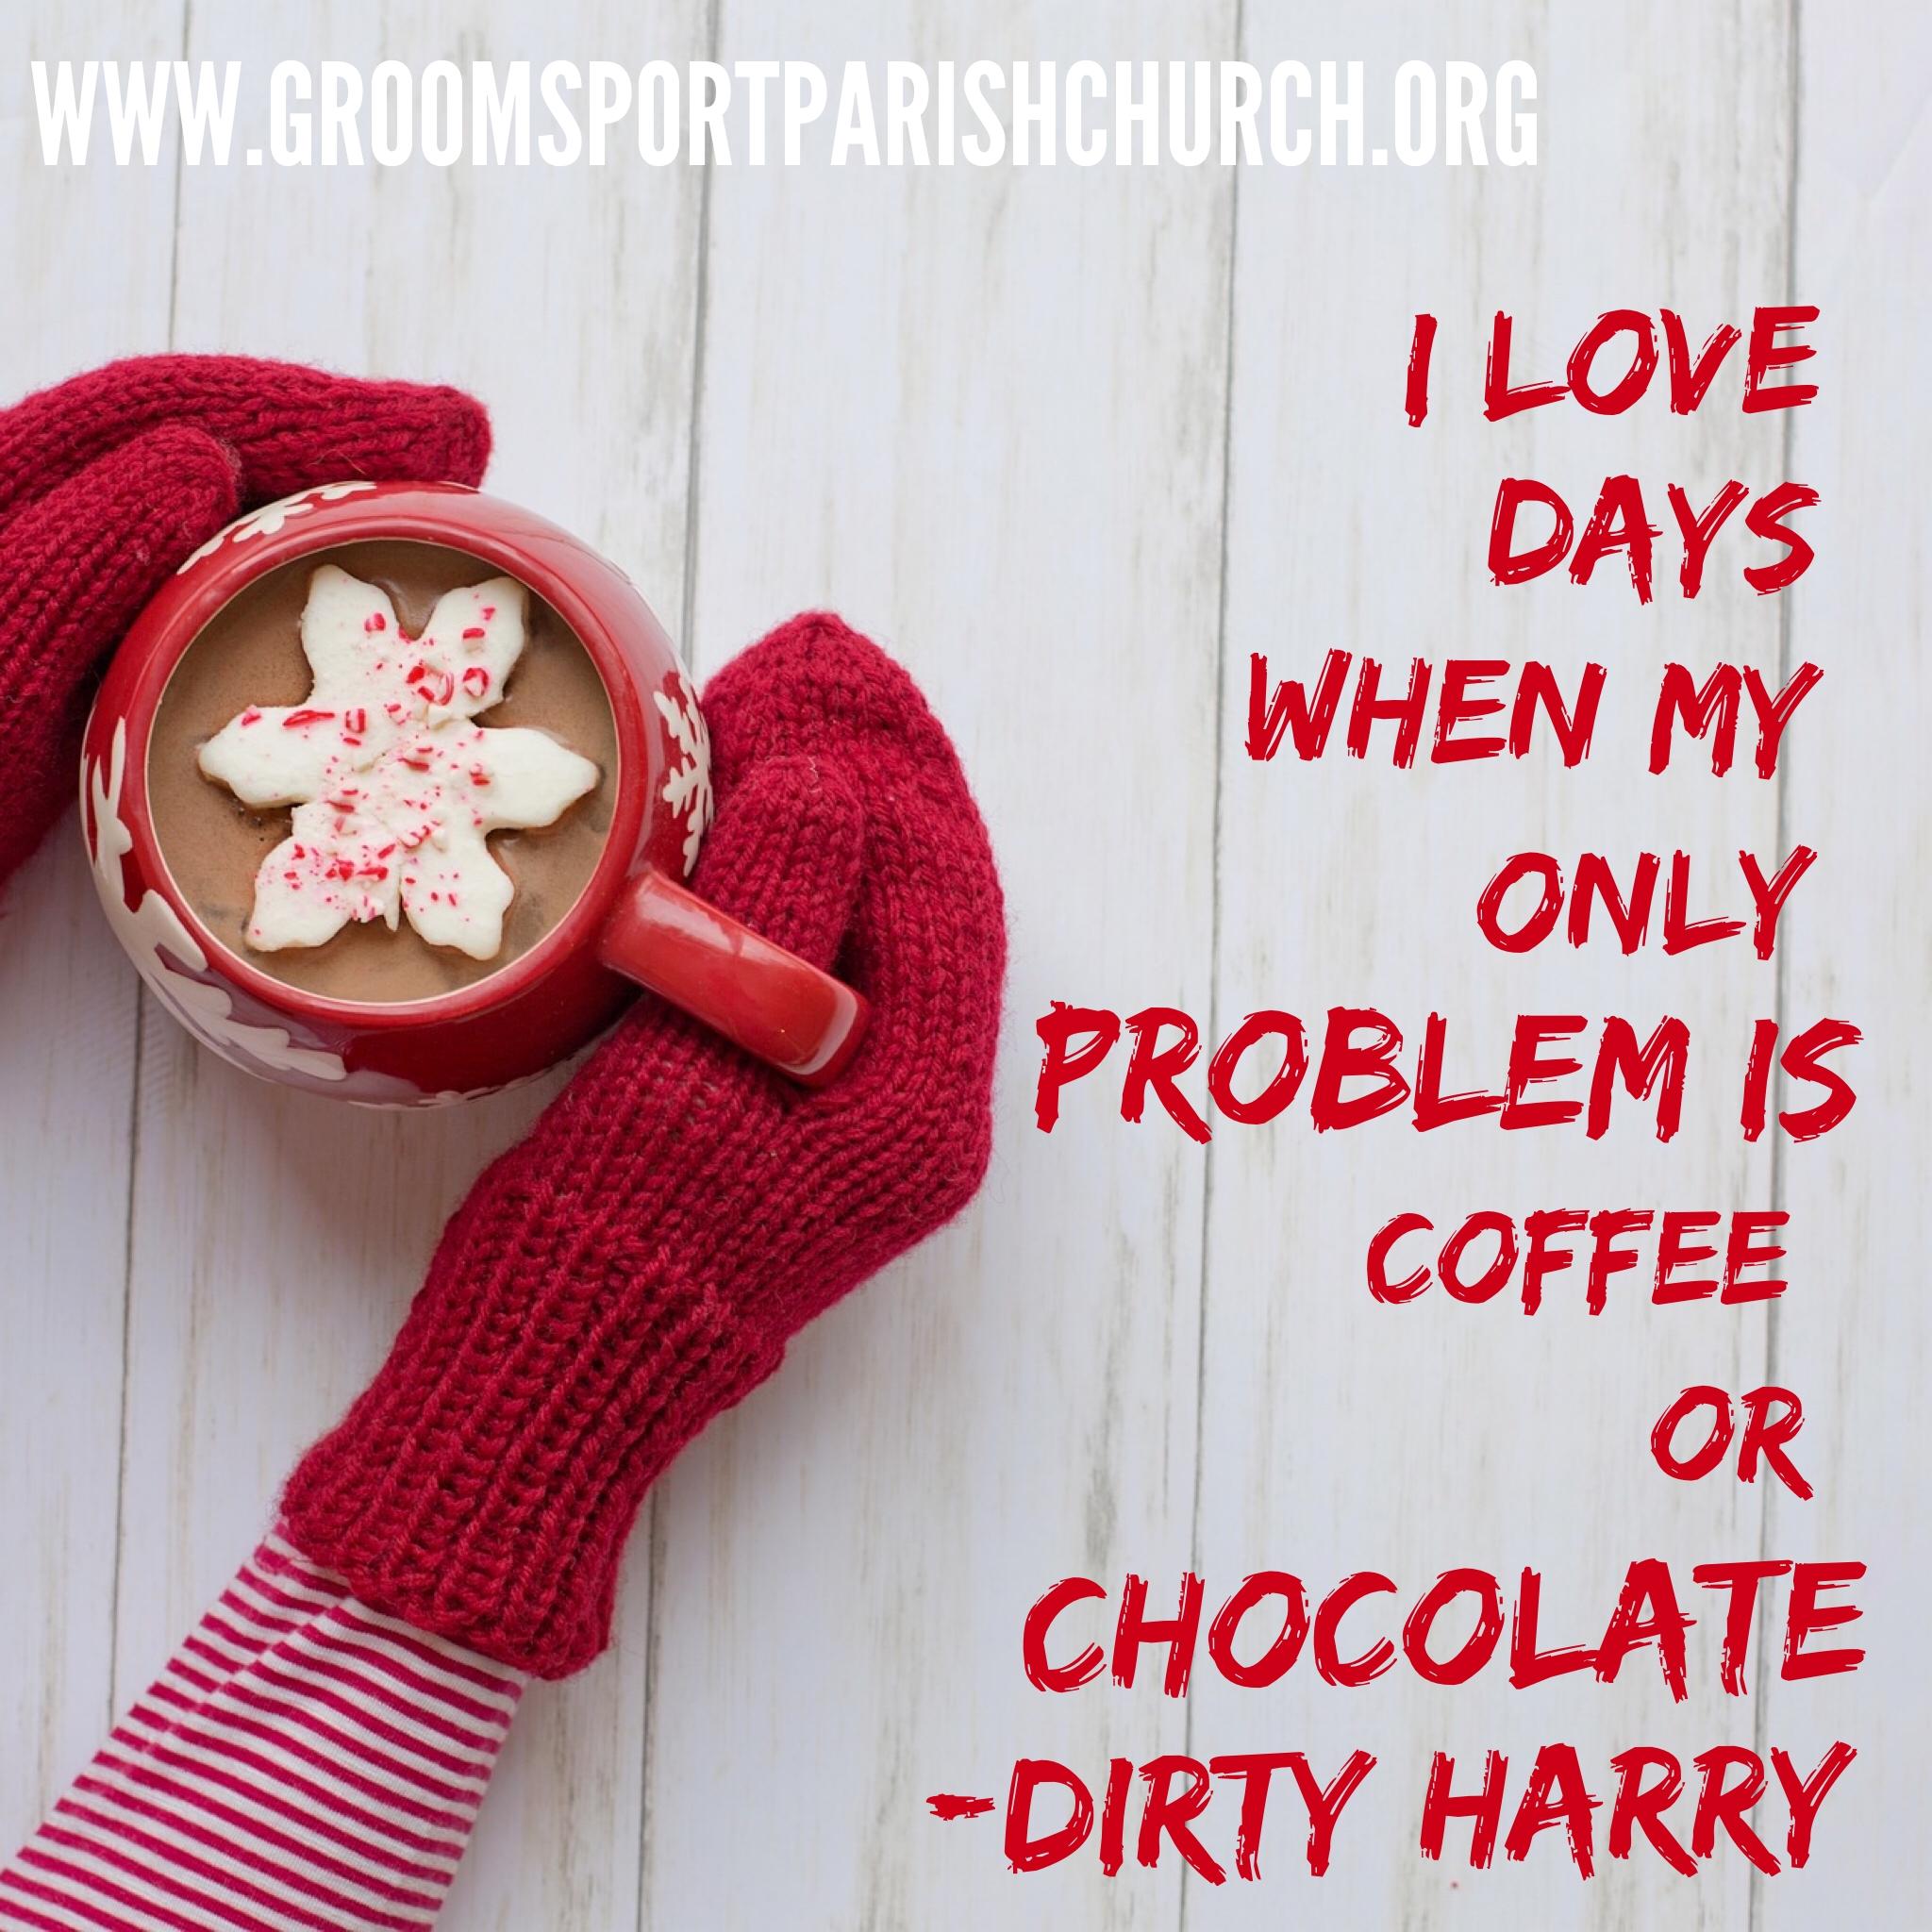 Coffee Or Chocolate National Hot Chocolate Day In 2020 Hot Chocolate Party Chocolate Party Hot Chocolate